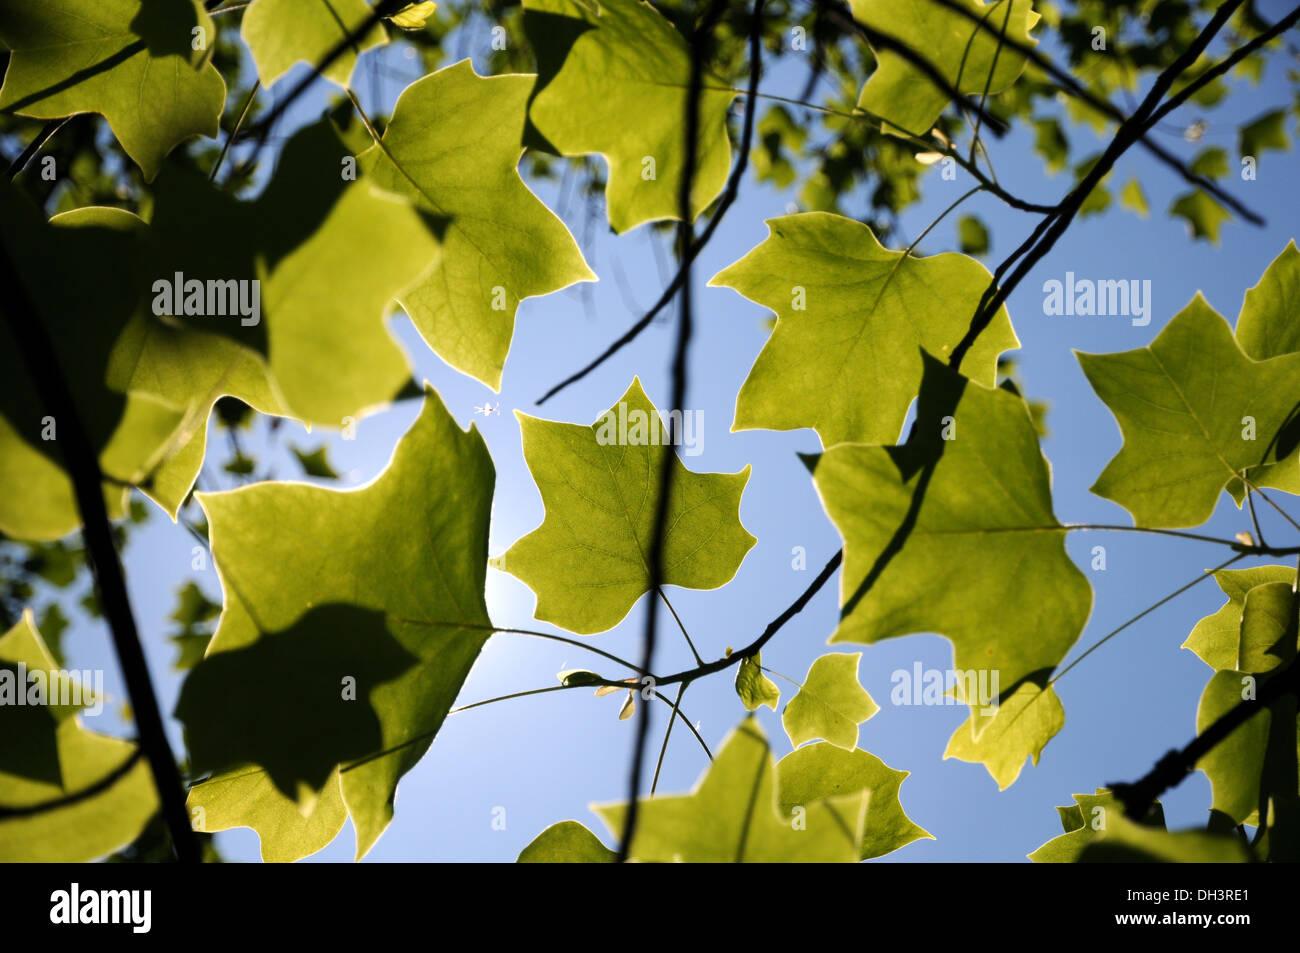 Tulip Tree Stock Photos & Tulip Tree Stock Images - Alamy